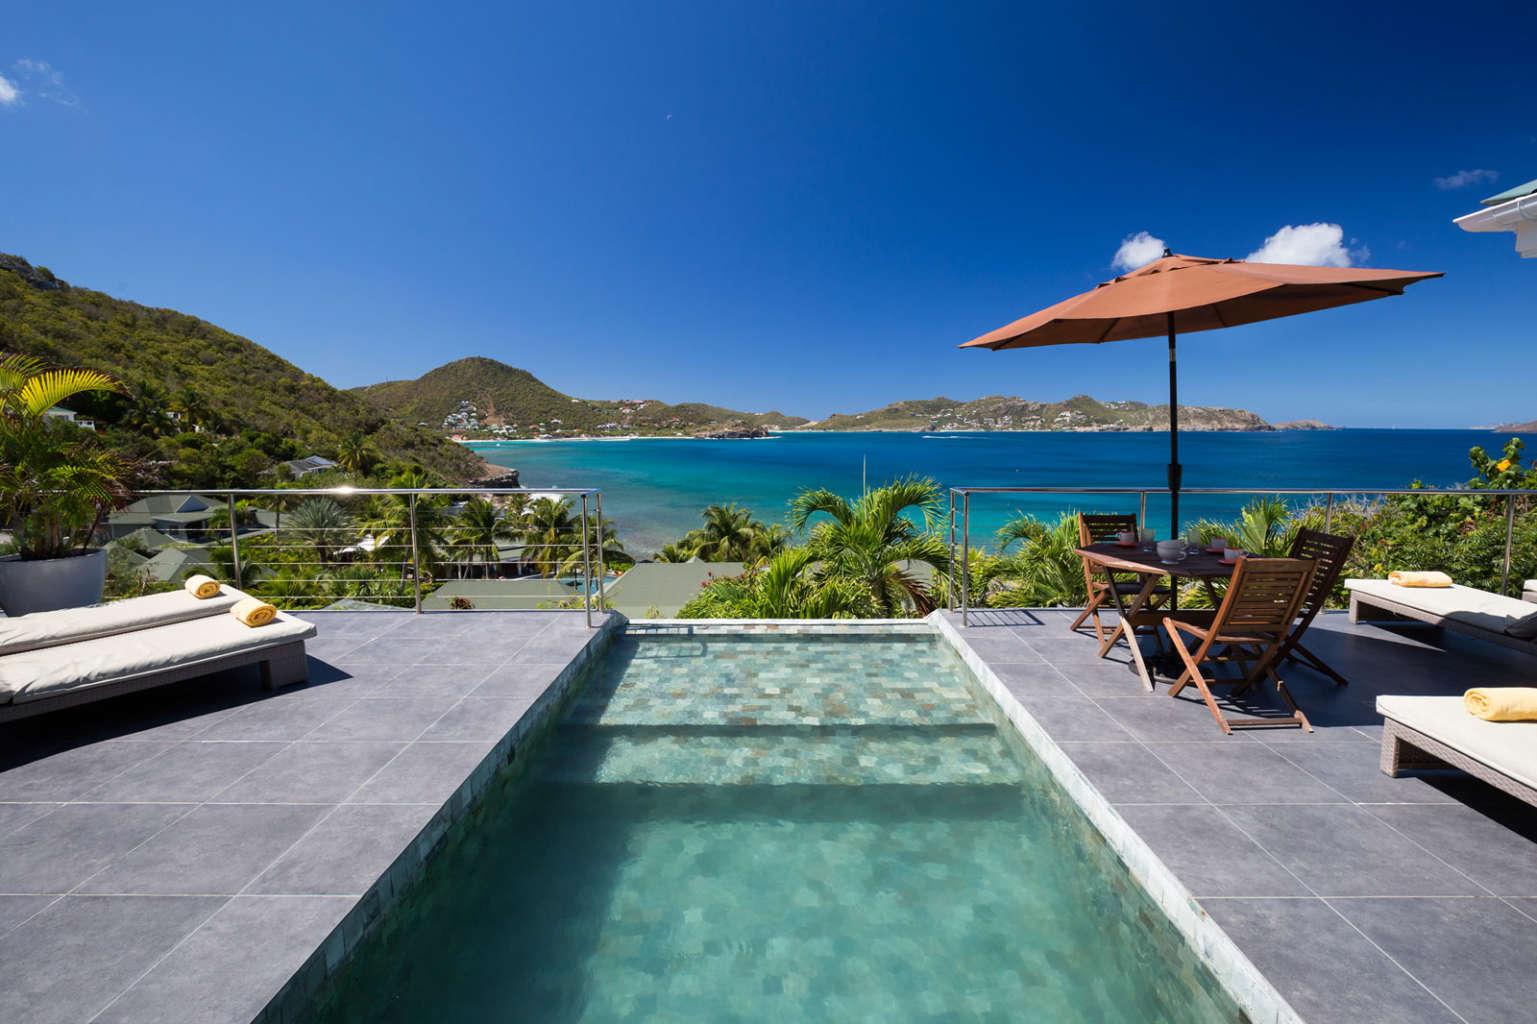 Villa Mirande - 4 Bedroom Villa Rental St Barth Height of Pointe Milou - Swimming Pool